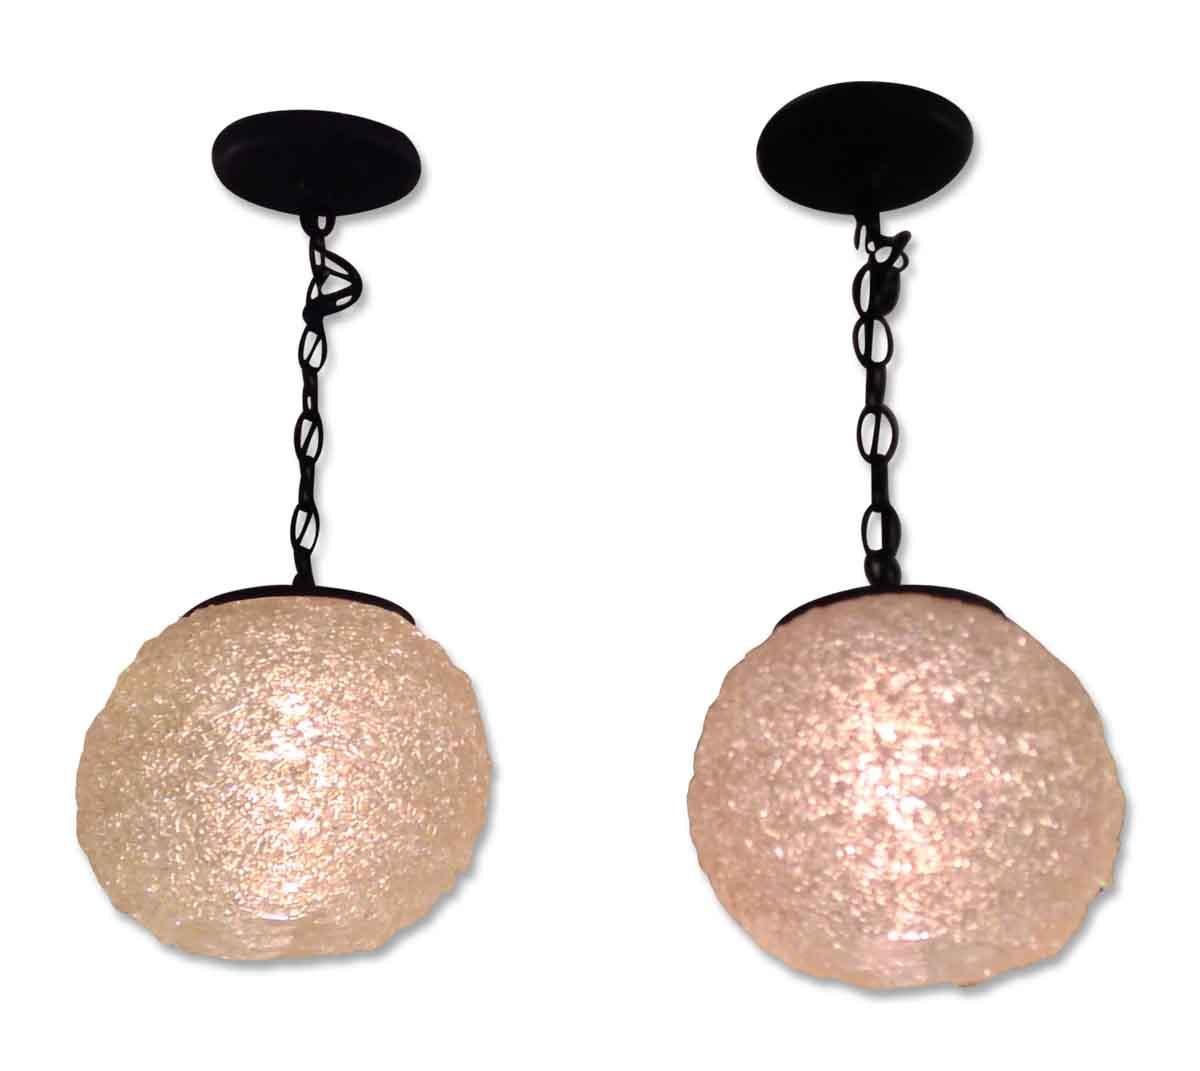 Acrylic Ball Mid Century Pendant Lights